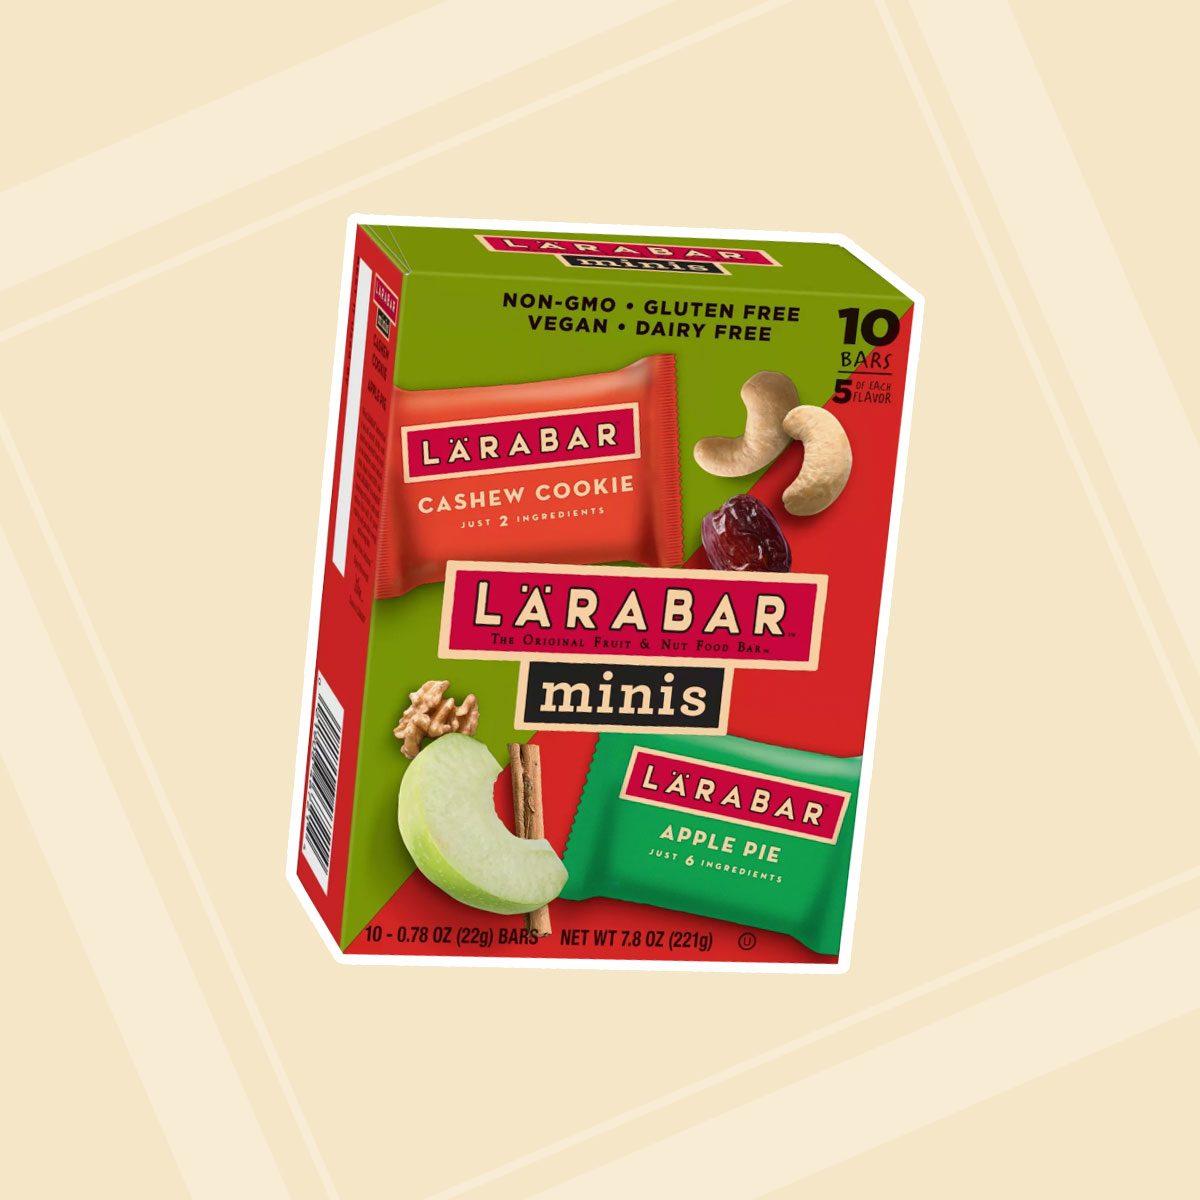 Larabar Minis Apple Pie & Cashew Cookies